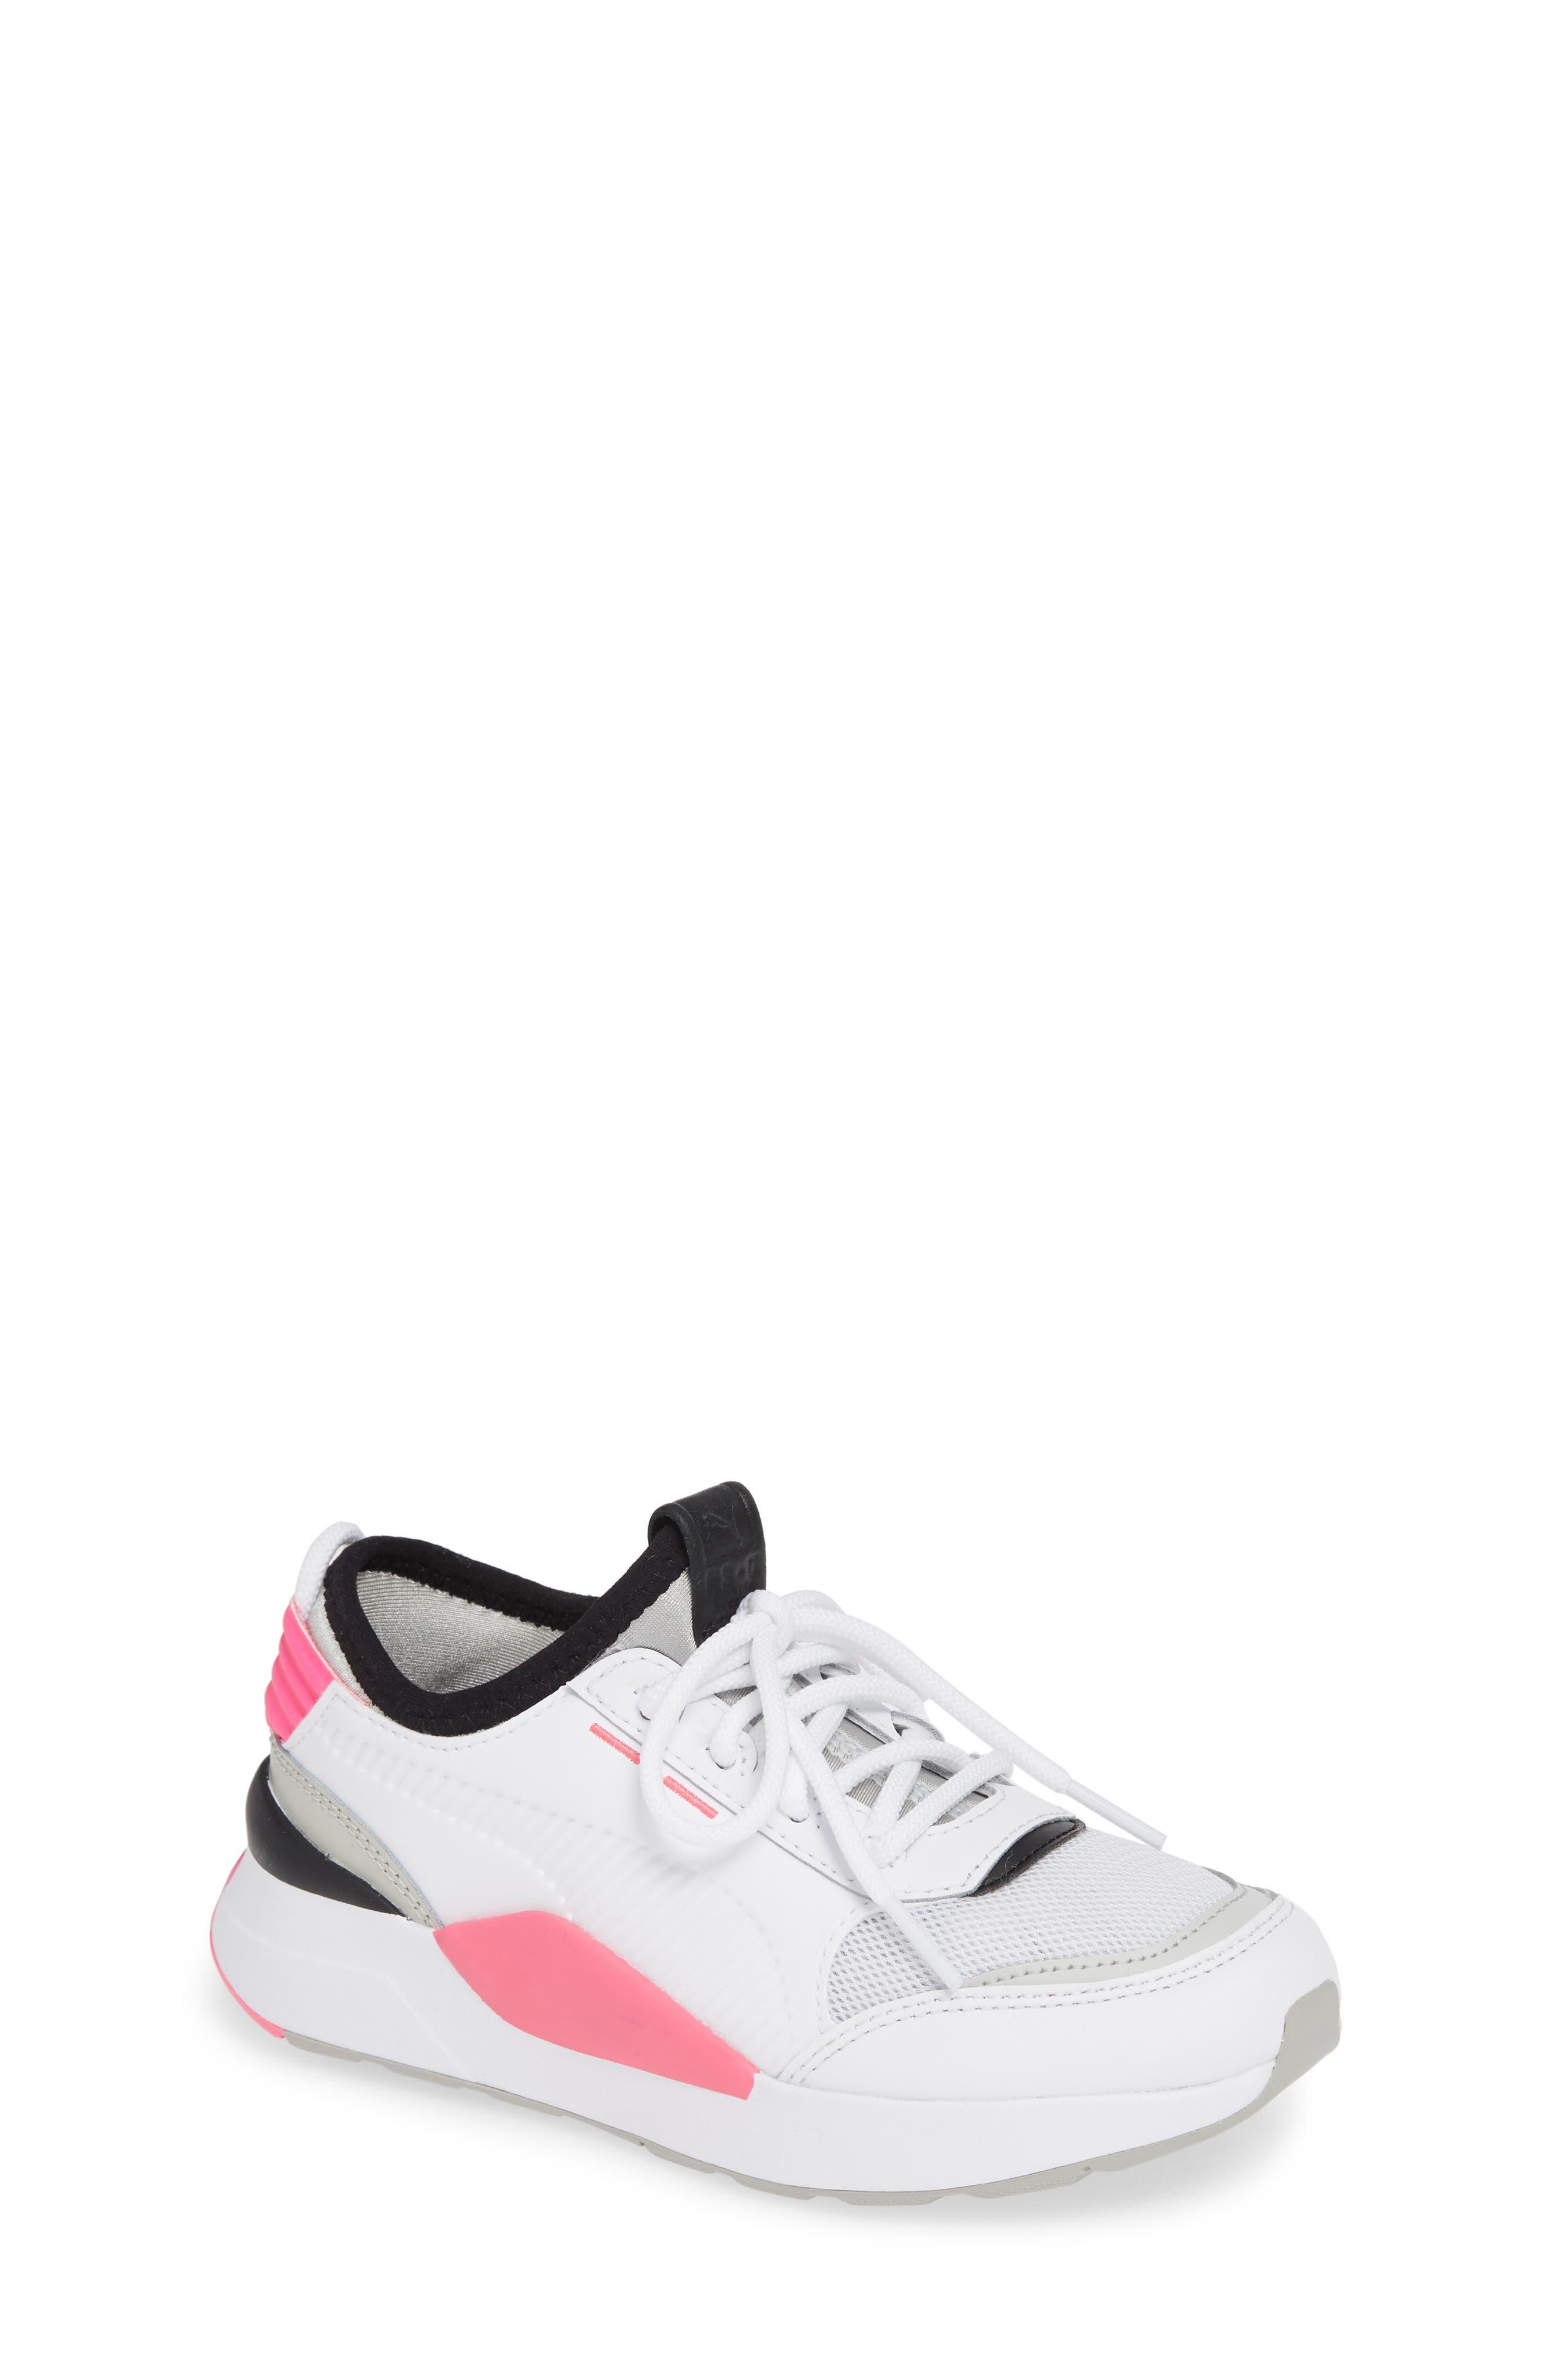 RS-0 Play Sneaker,                             Main thumbnail 1, color,                             101